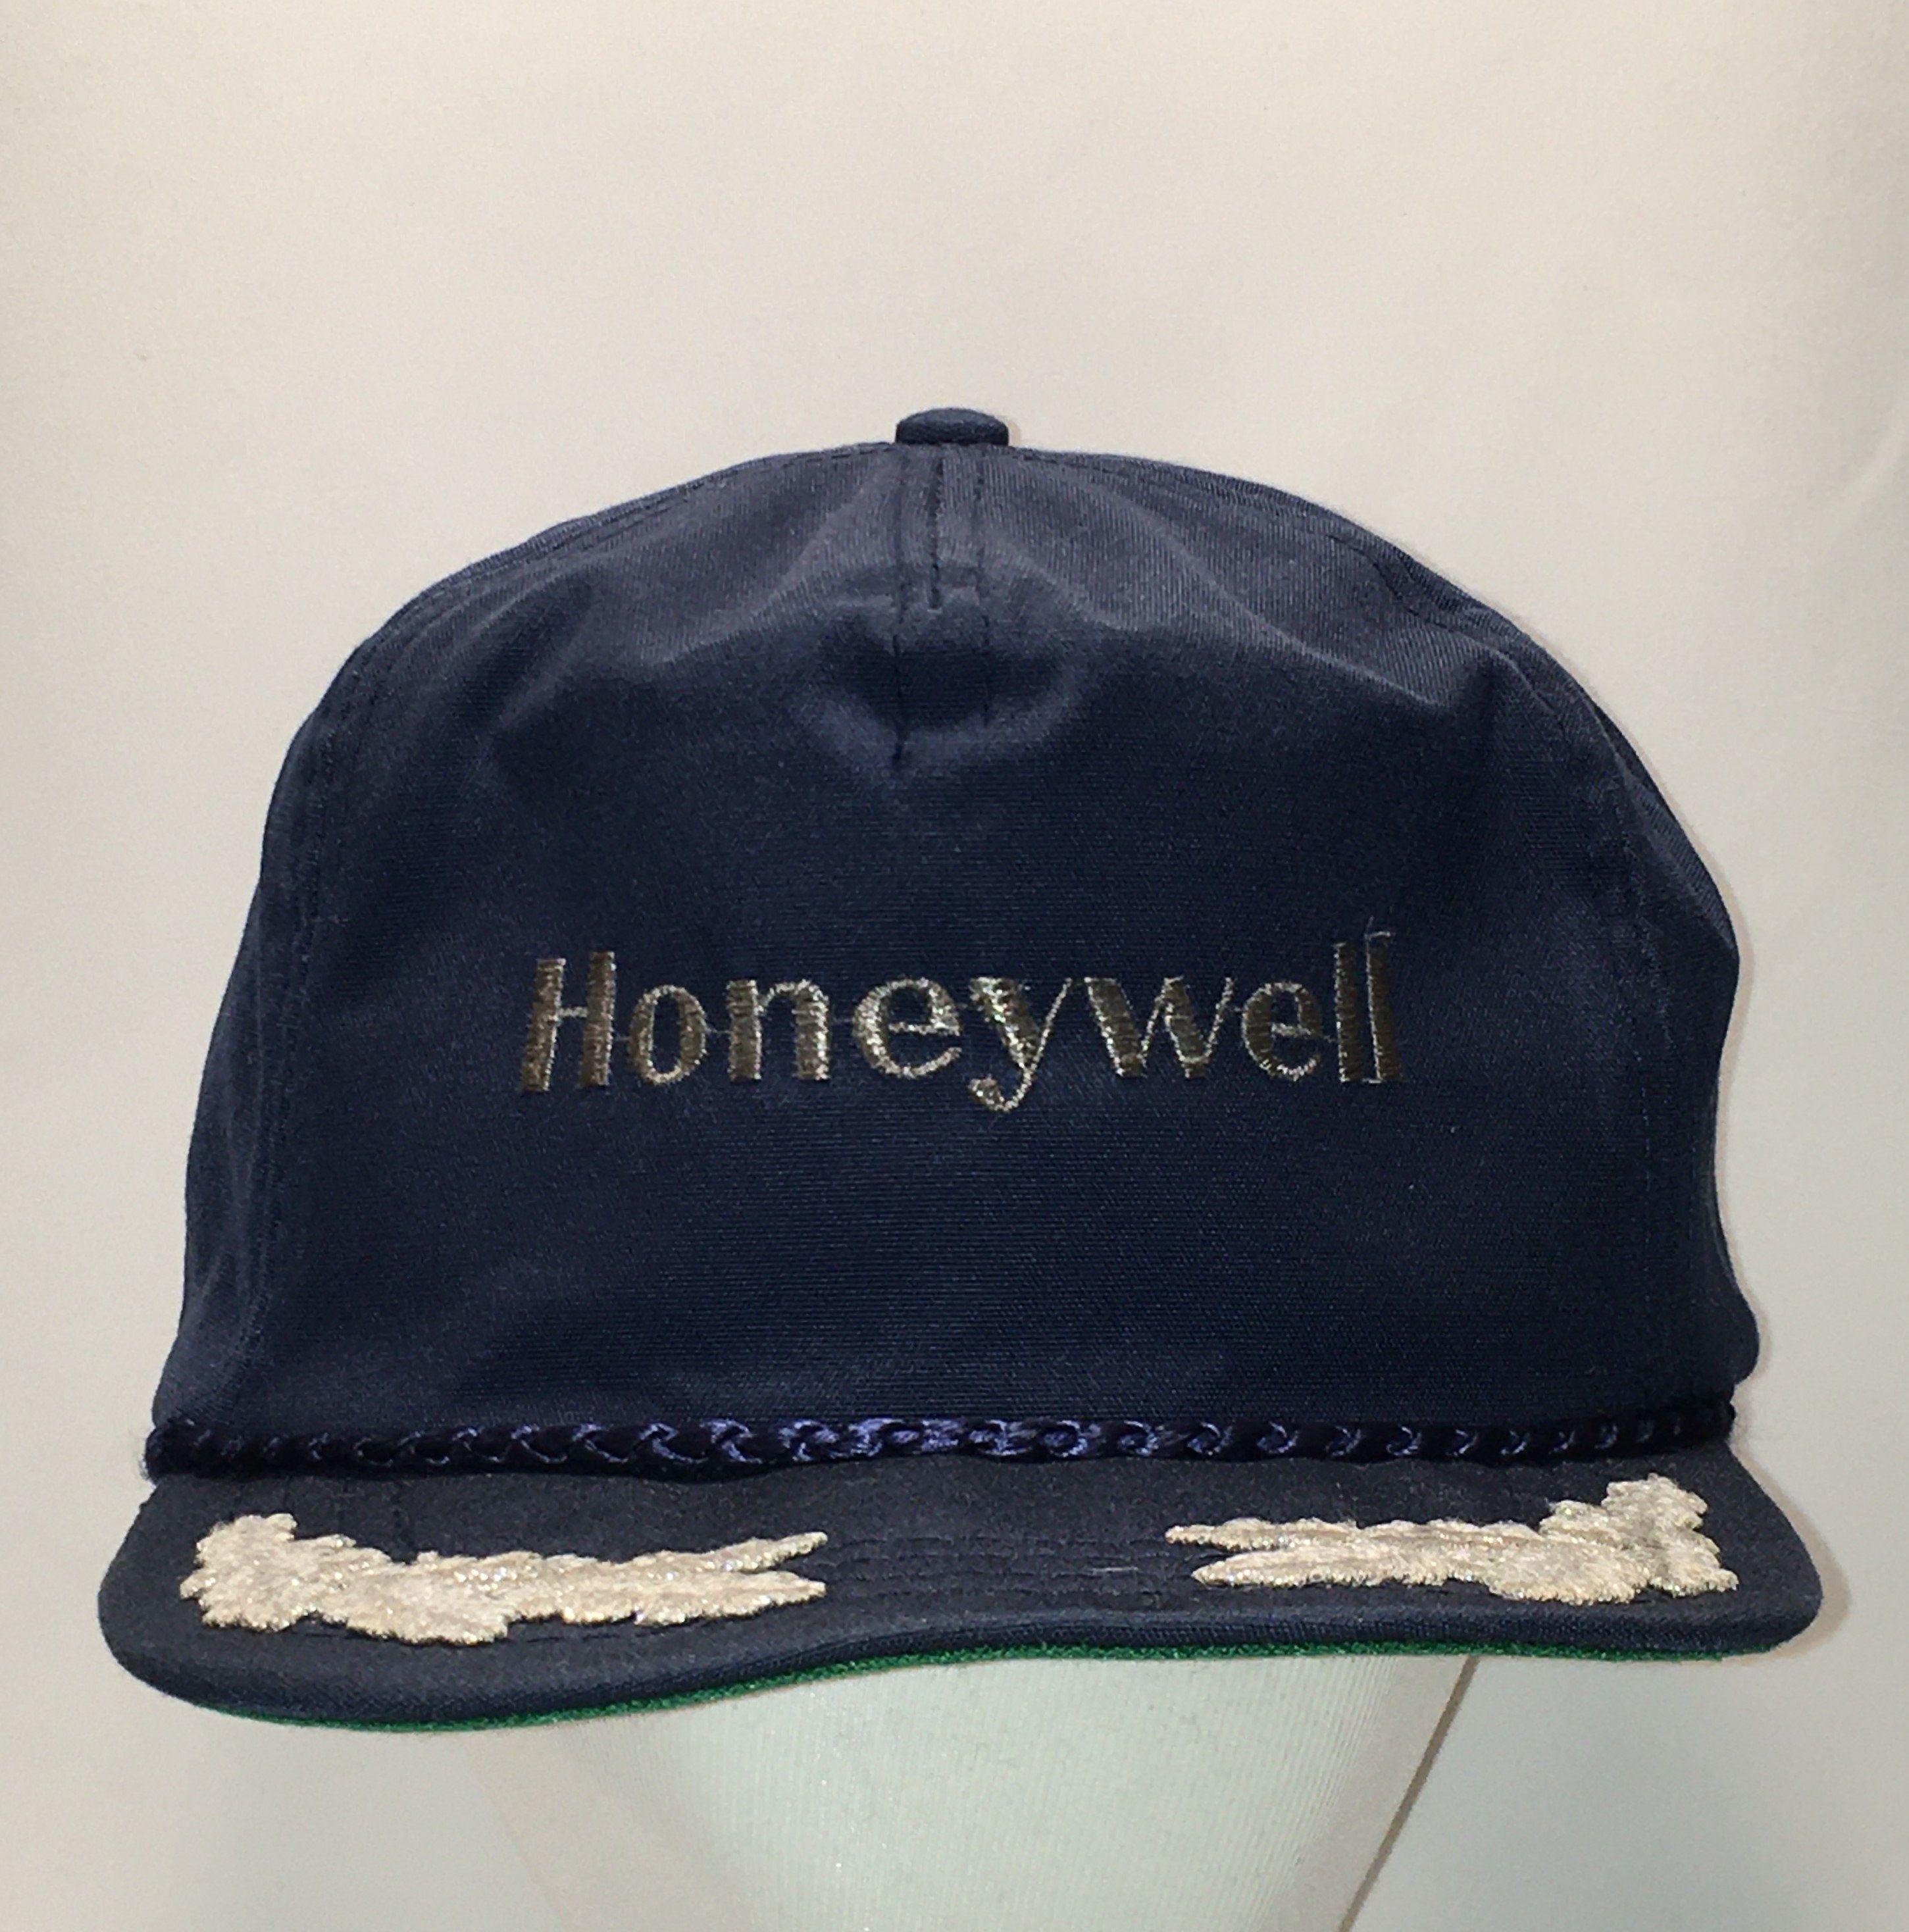 Vintage Made In Usa Hat Honeywell Baseball Cap Aerospace Dad Etsy Hats For Men Men S Hat Dad Hats